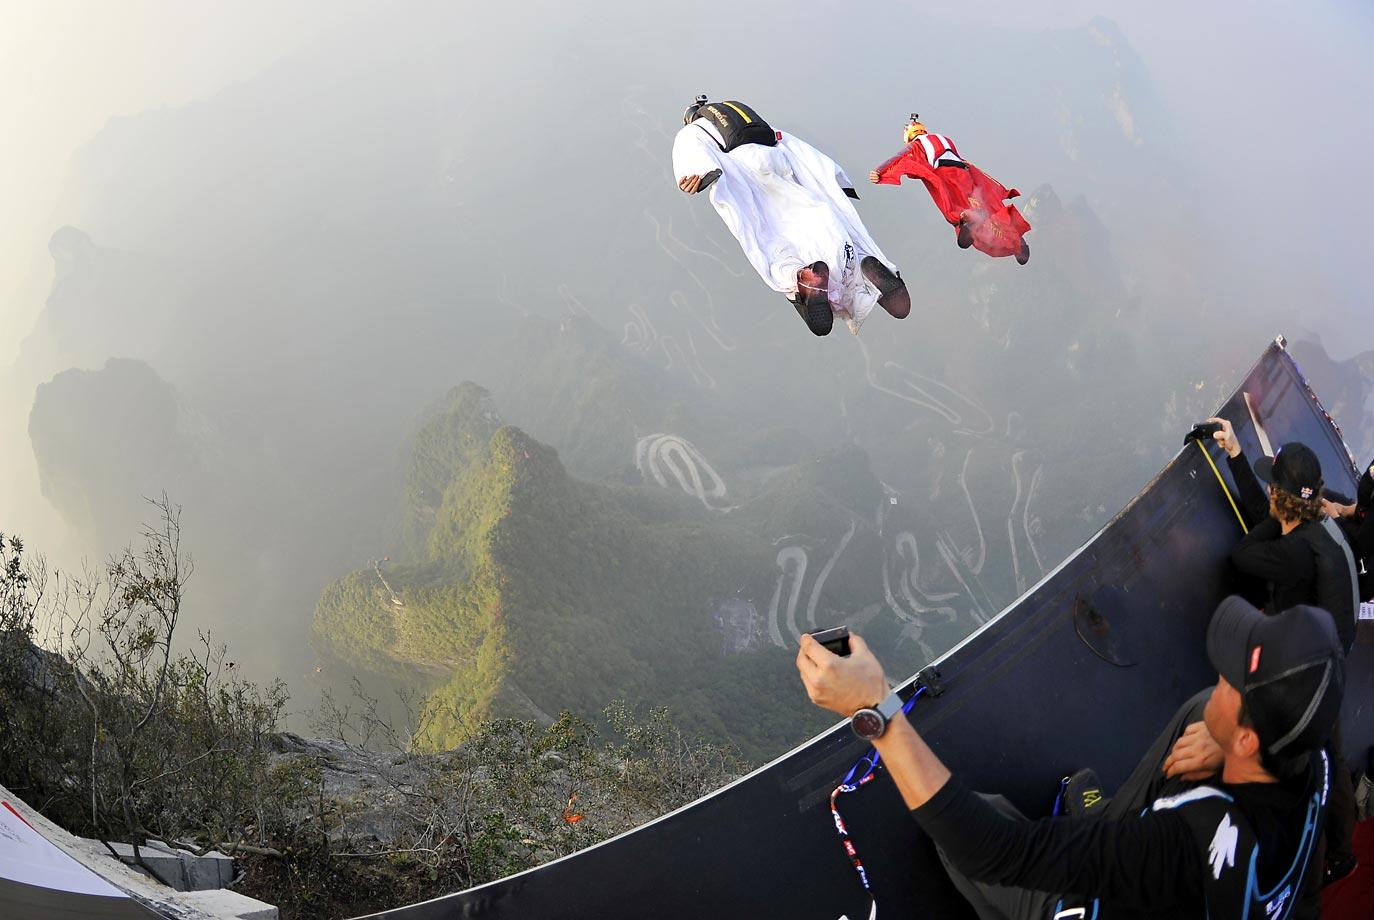 The Wingsuit Flying World Championship in Zhangjiajie, Hunan province of China.